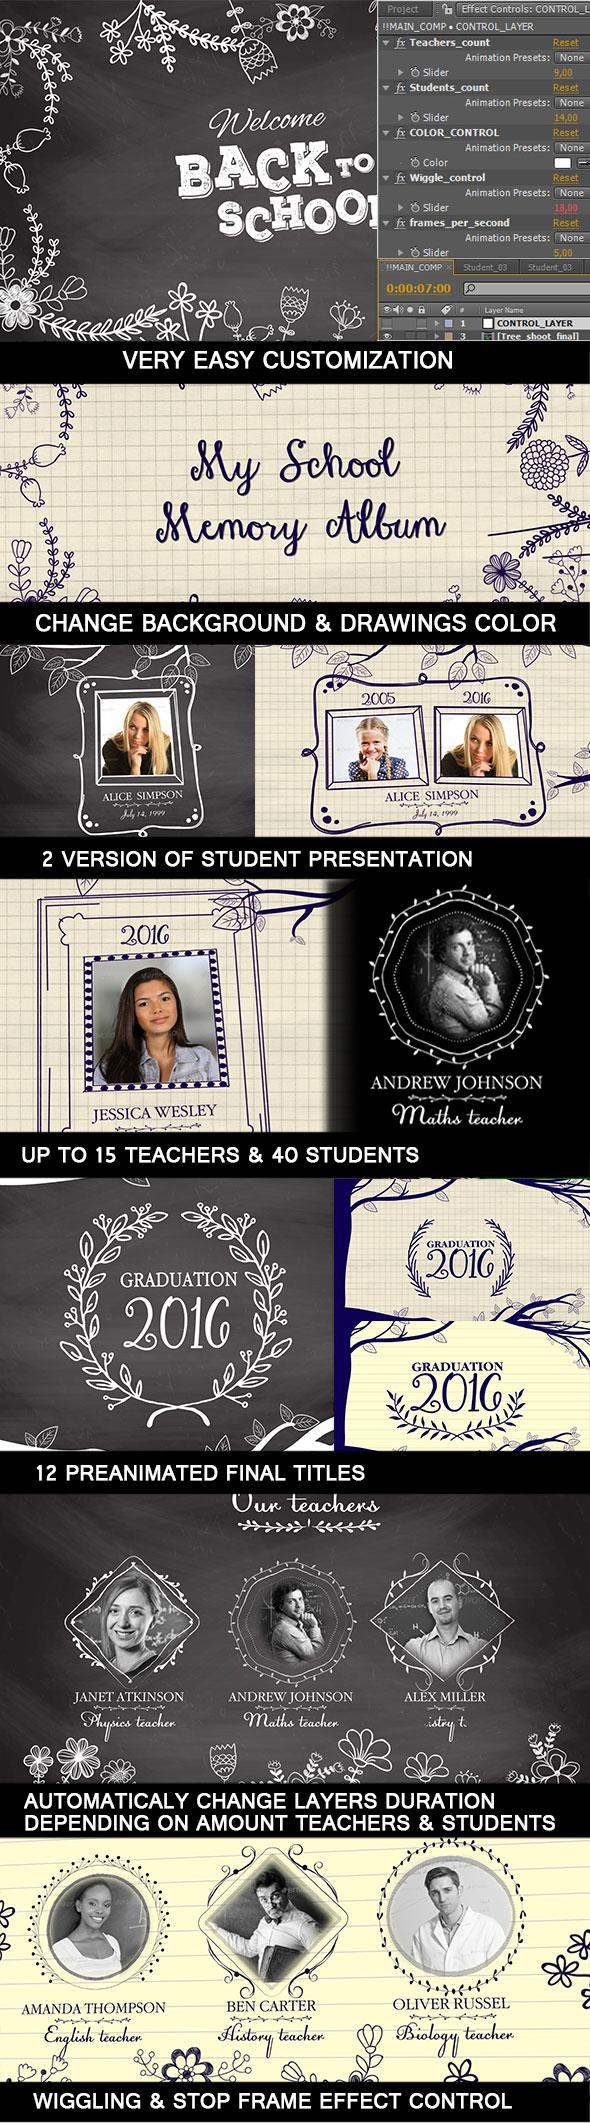 My School Memory Album & School Board Graduation Show